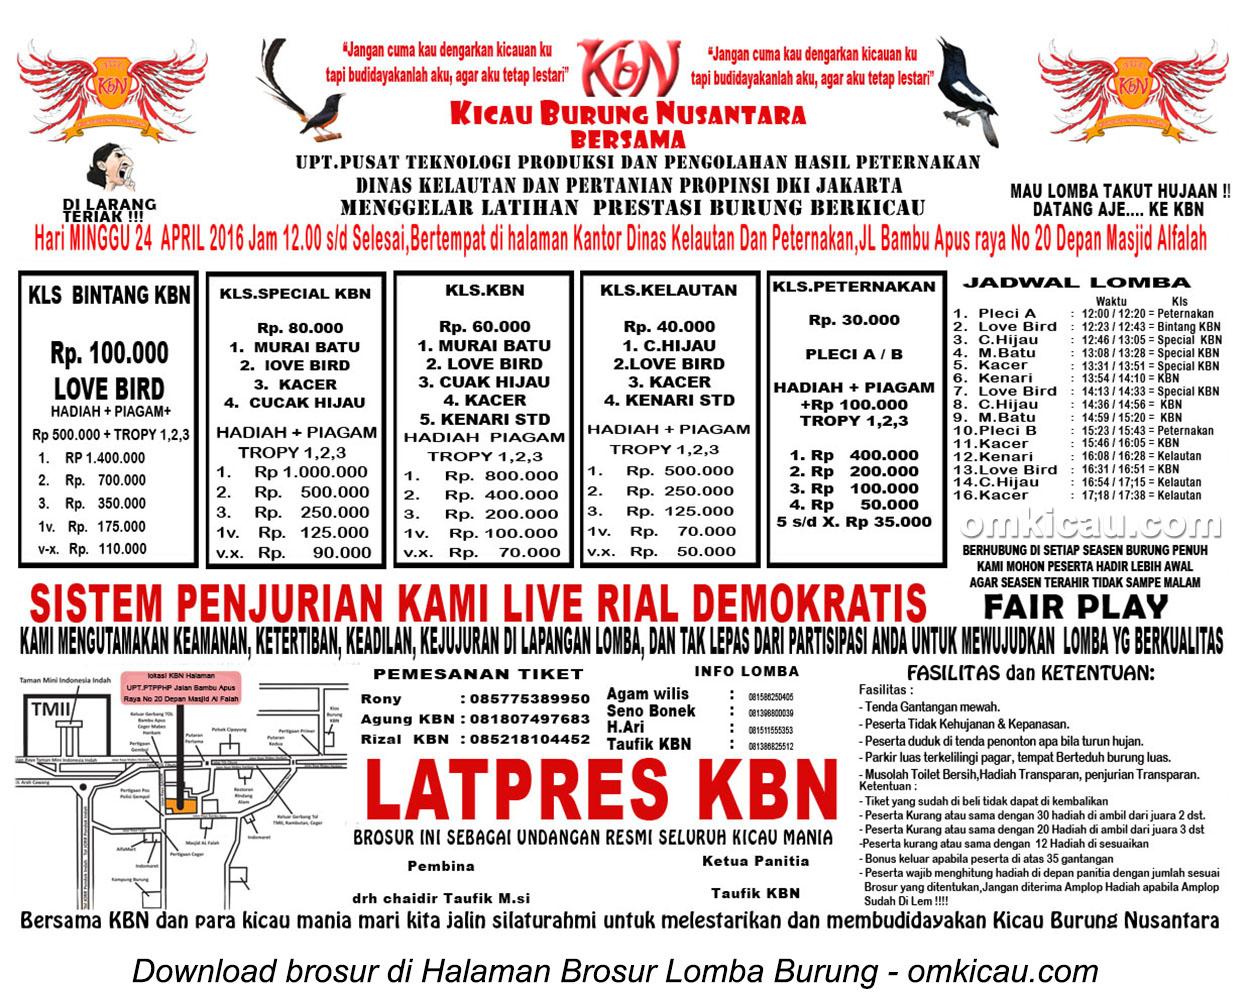 Brosur Latpres Burung Berkicau KBN, Jakarta Timur, 24 April 2016